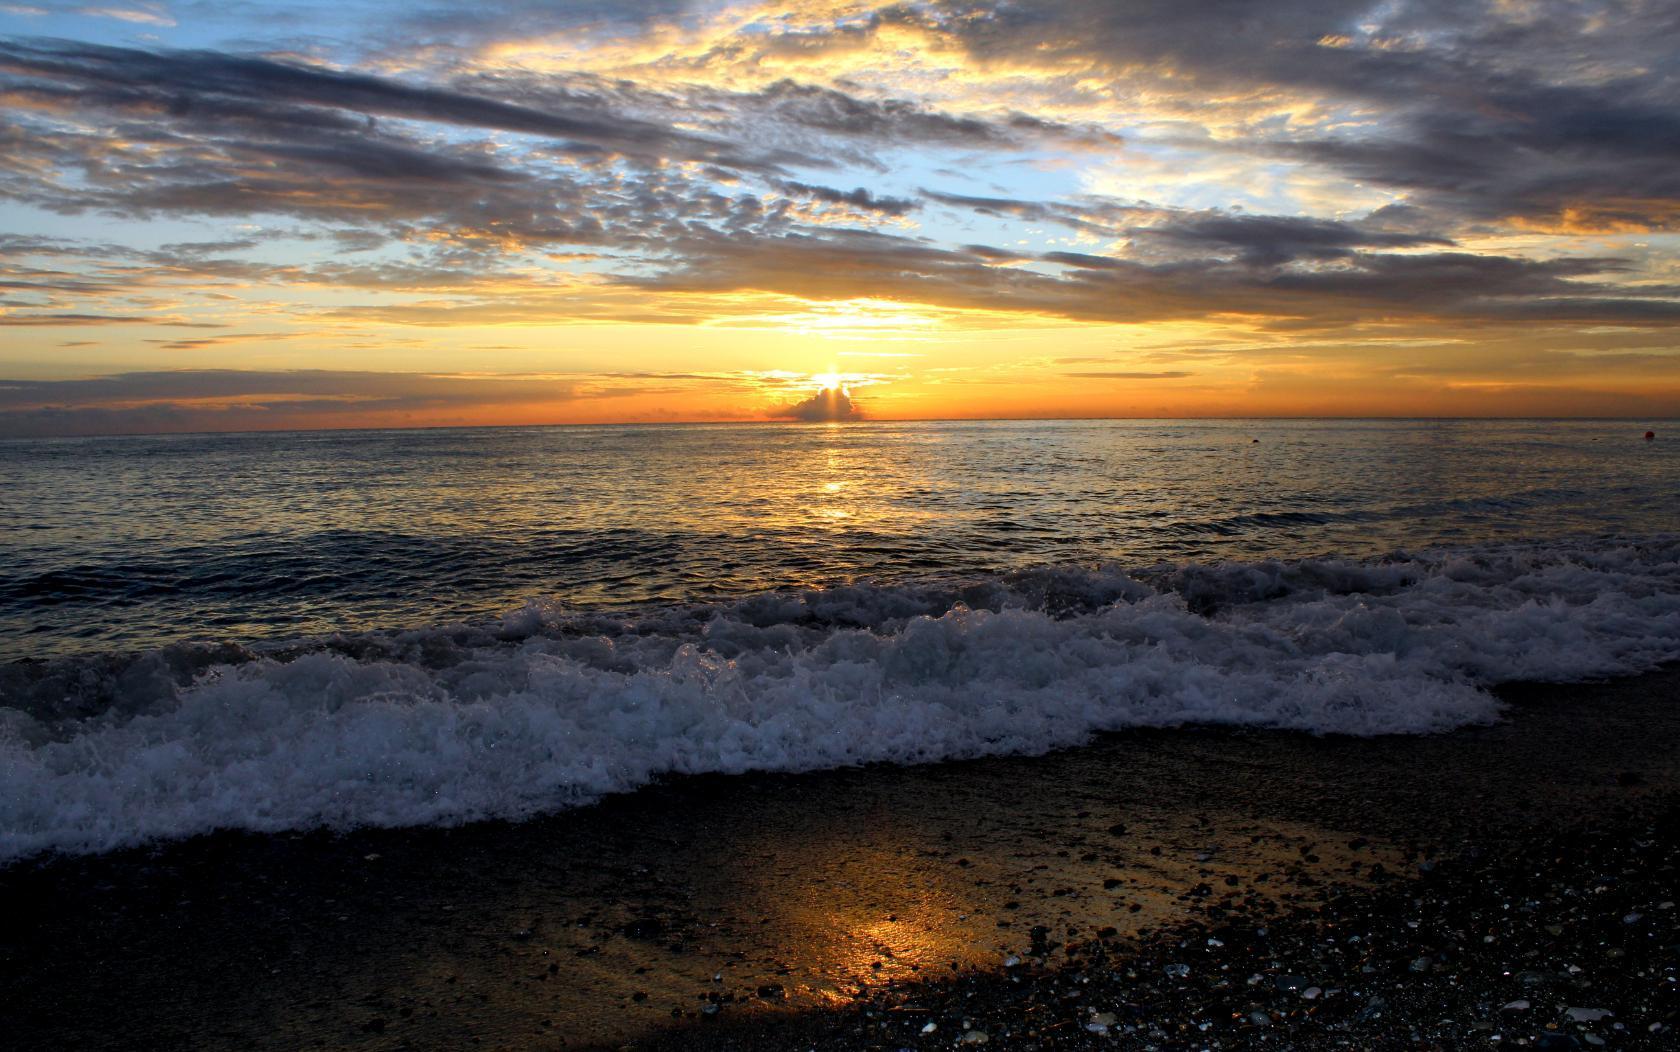 Море фото адлер сейчас